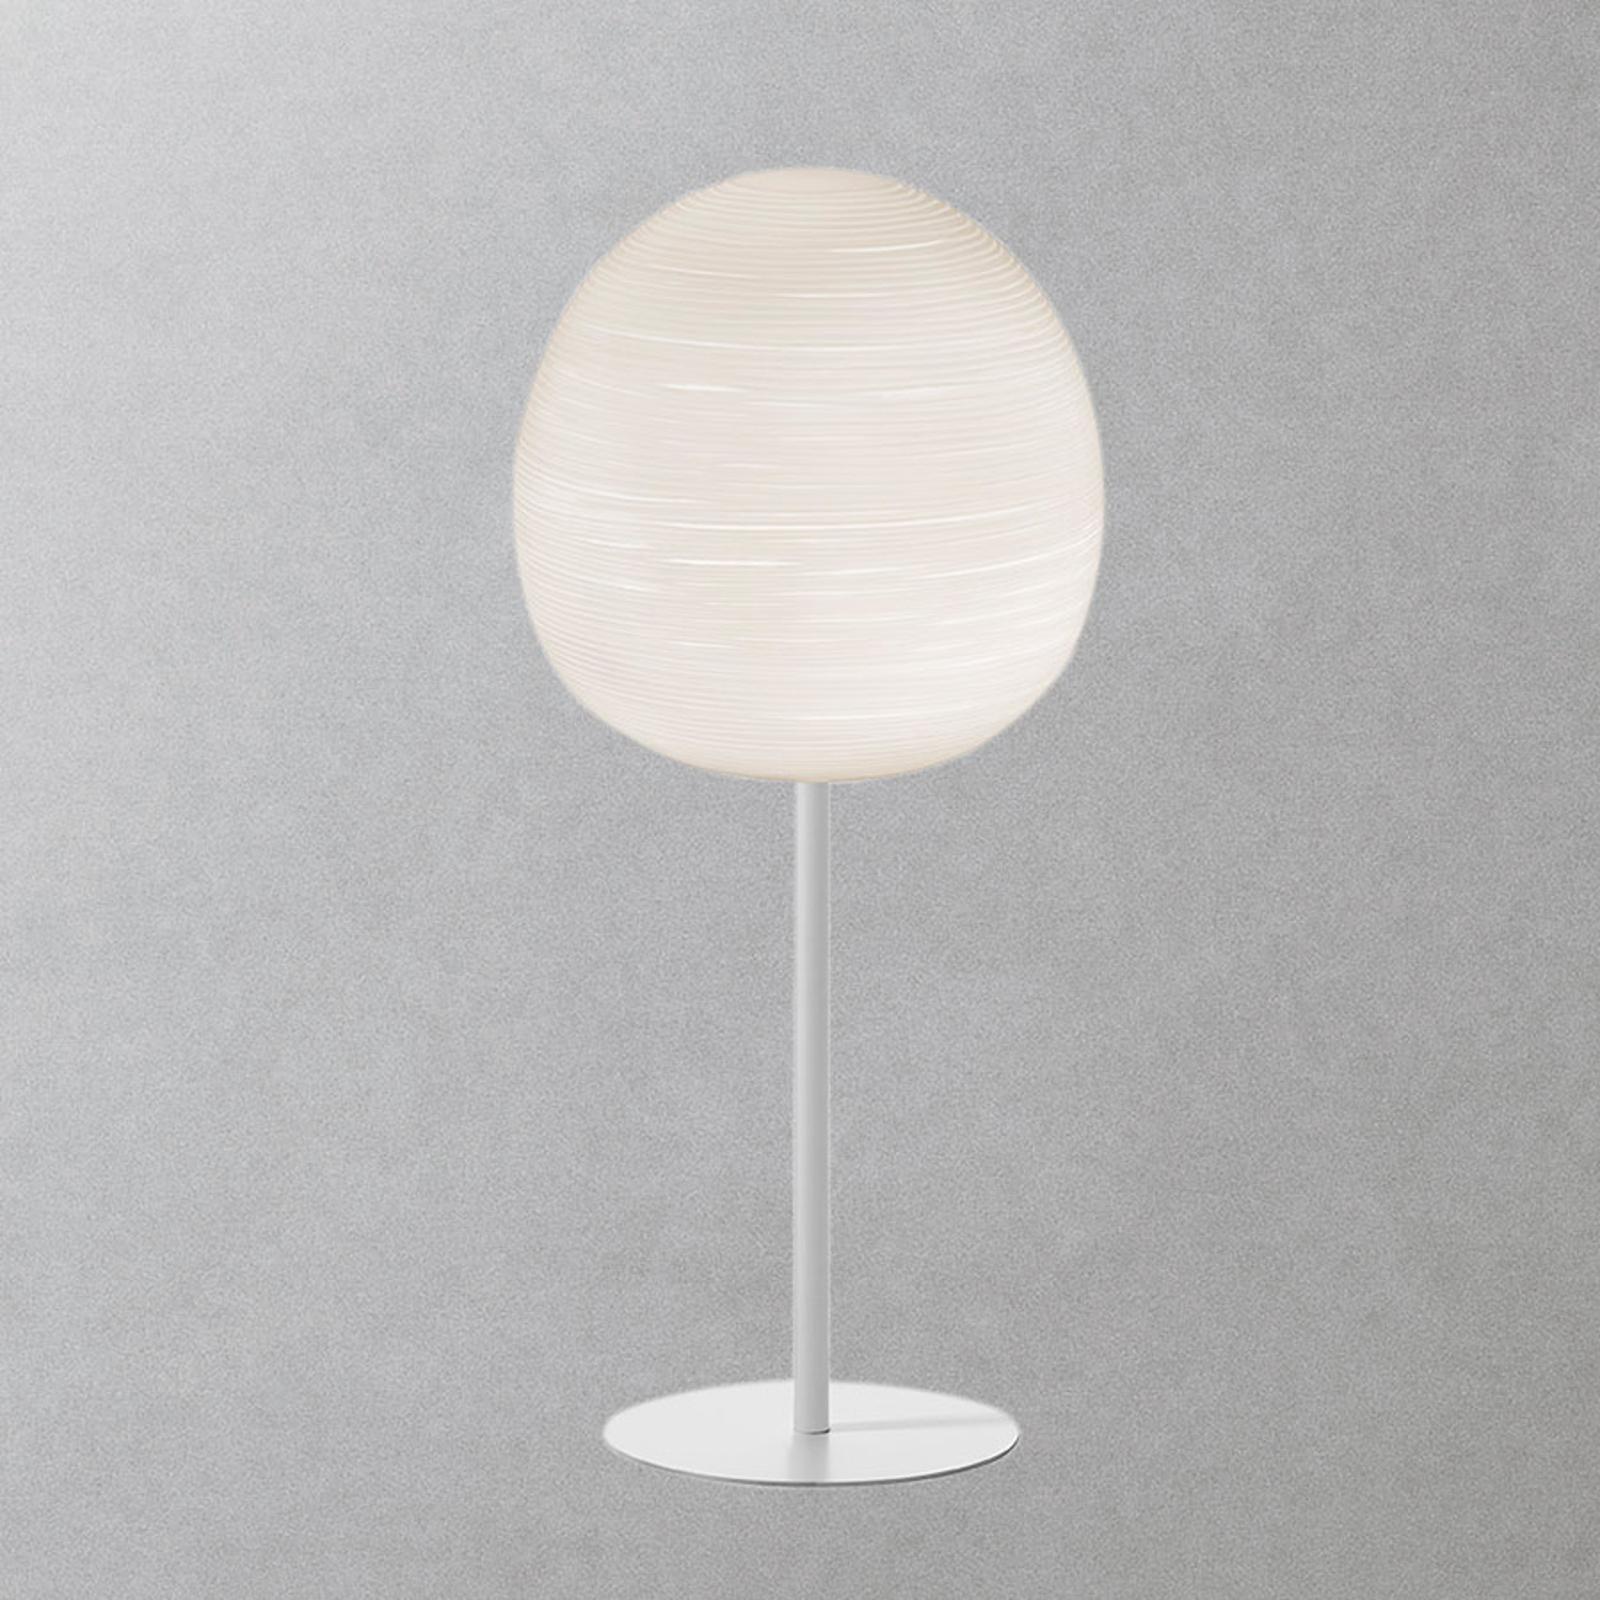 Foscarini Rituals XL alta Tischleuchte aus Glas kaufen